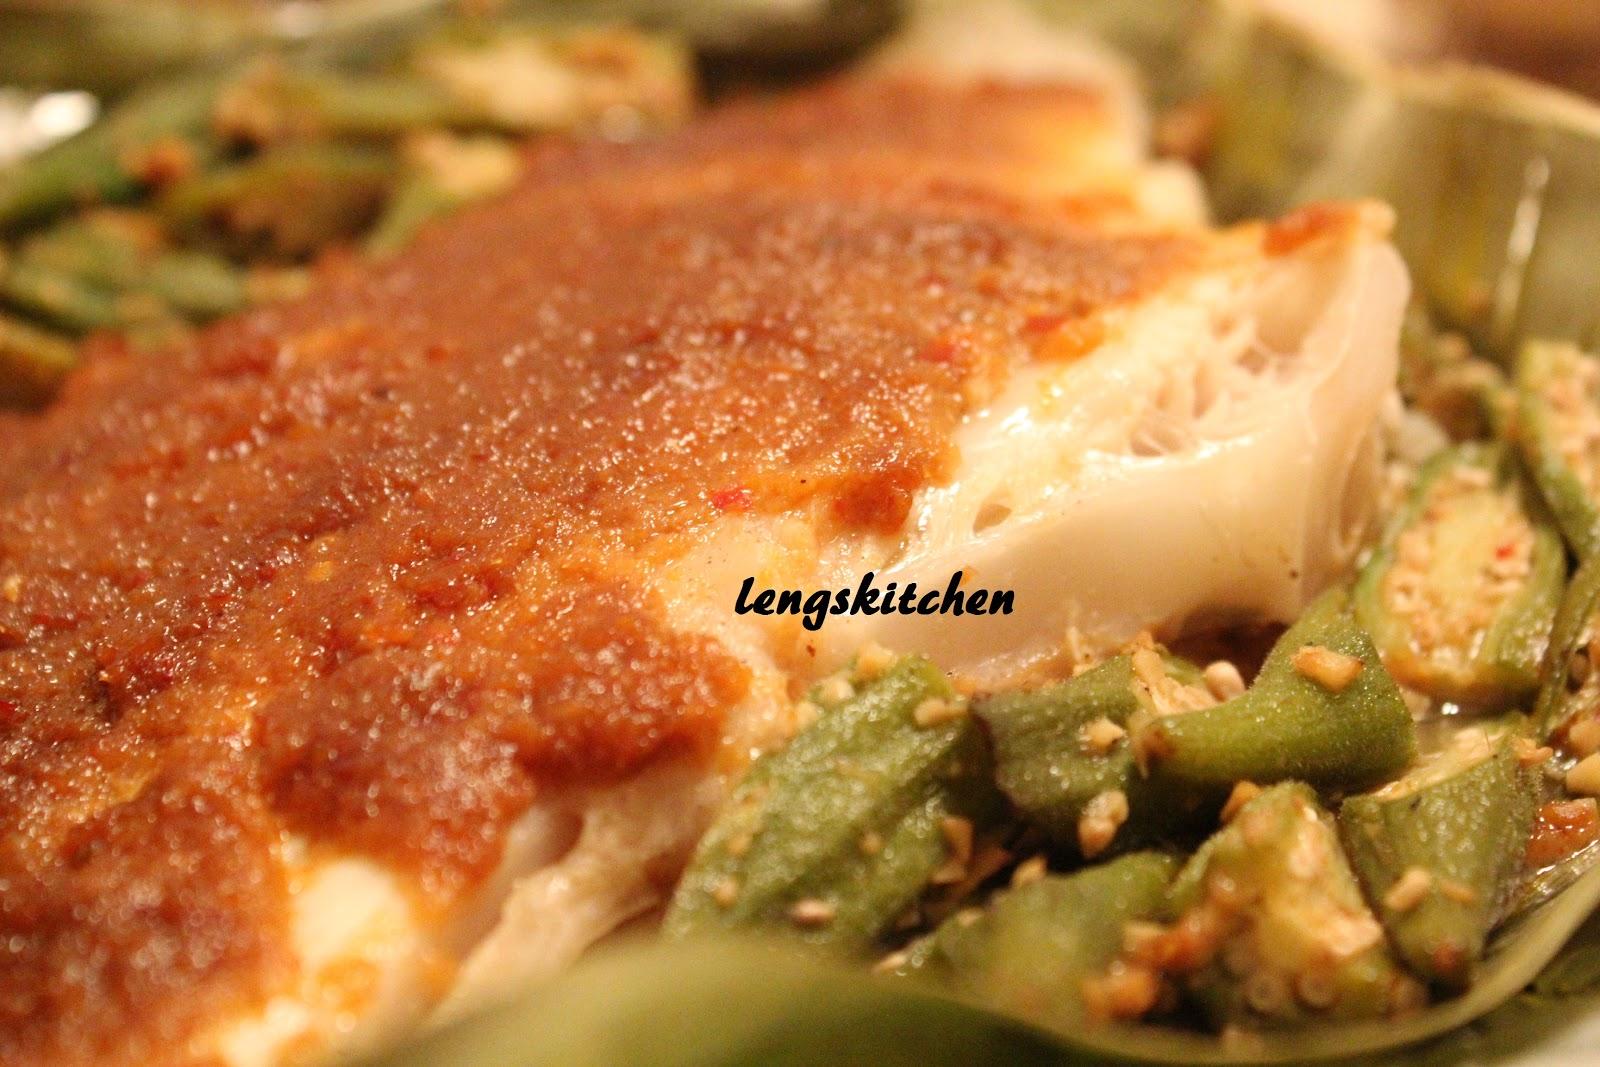 Kitchen Chaos: Ikan Bakar (Grilled Fish) 烧鱼